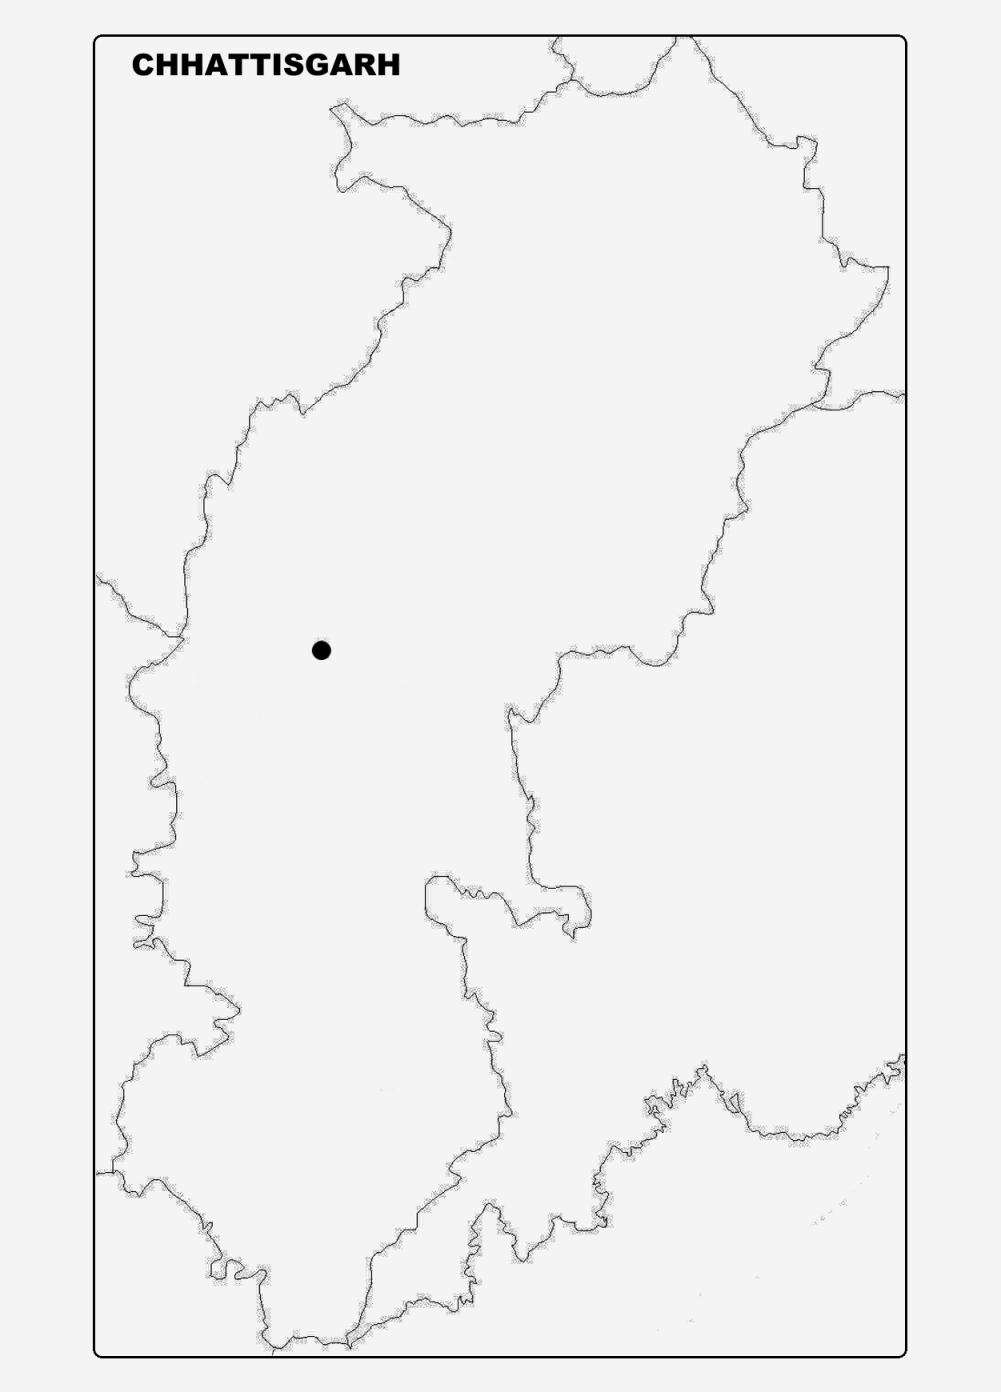 download Chhattisgarh map